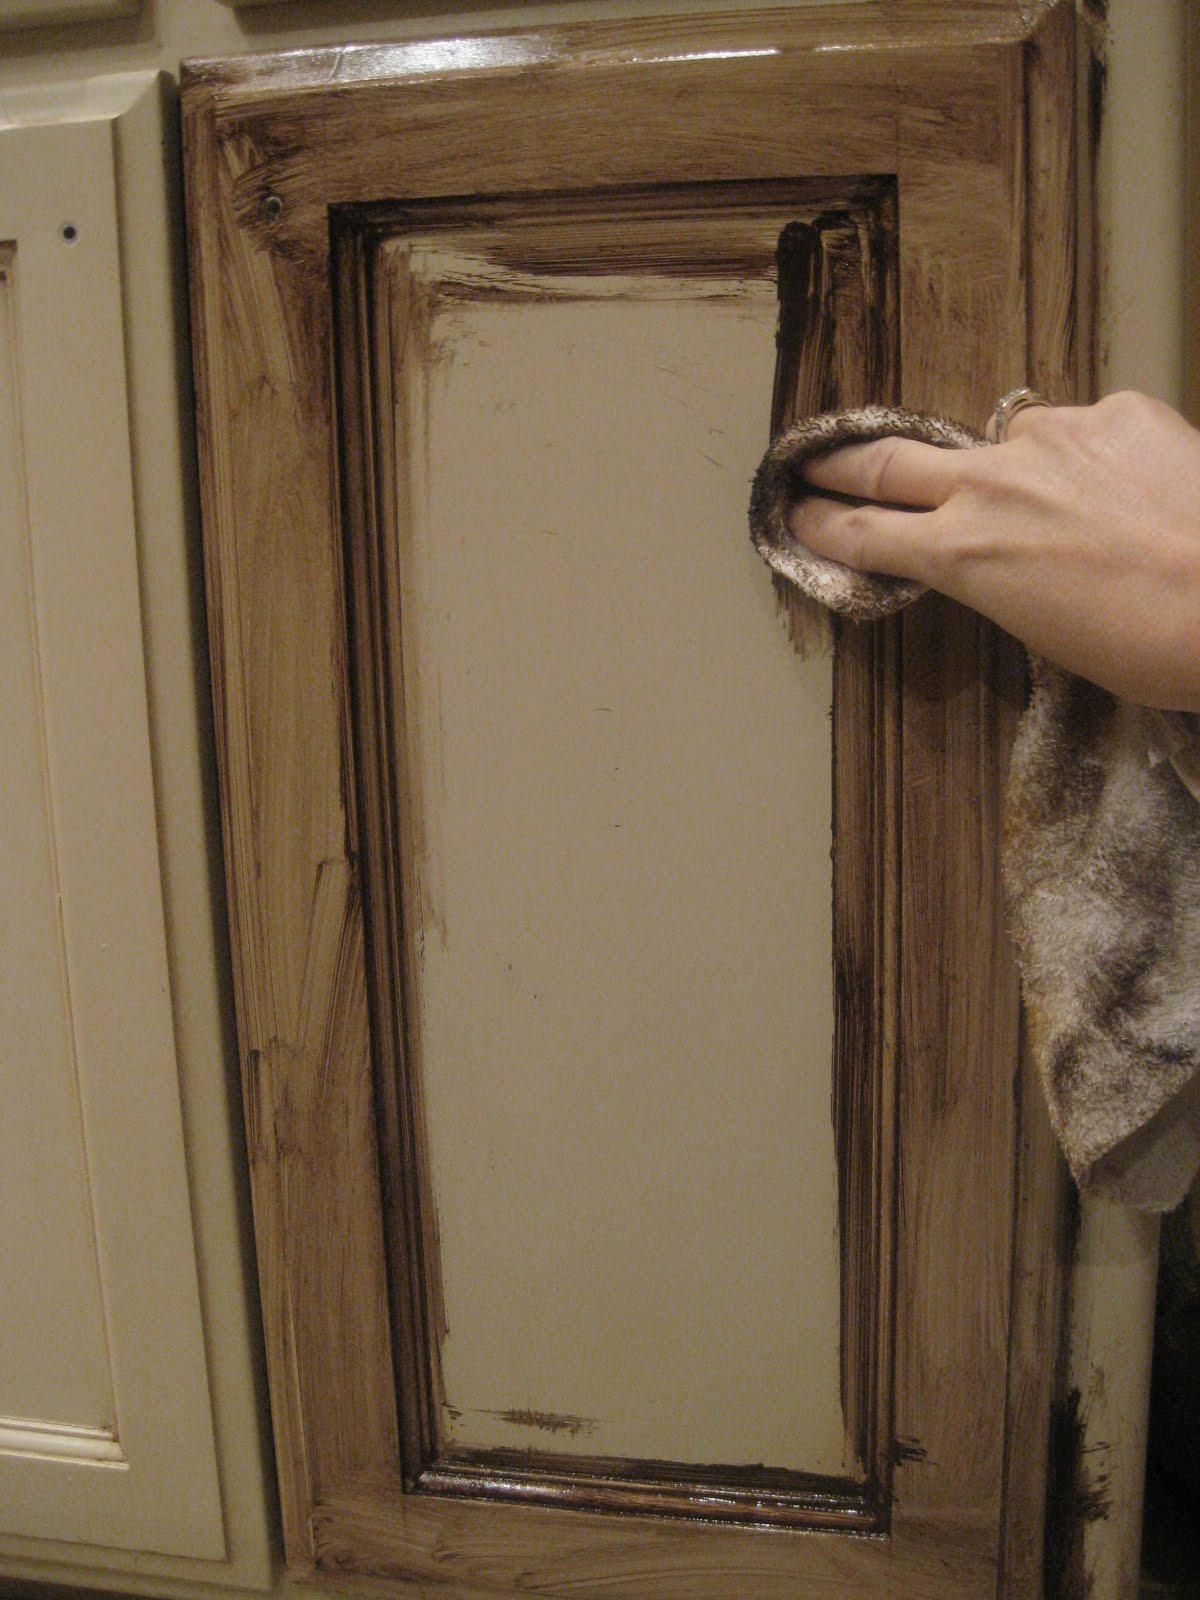 Glazed Kitchen Cabinets Japanese Knife Kristen 39s Creations Glazing Painted